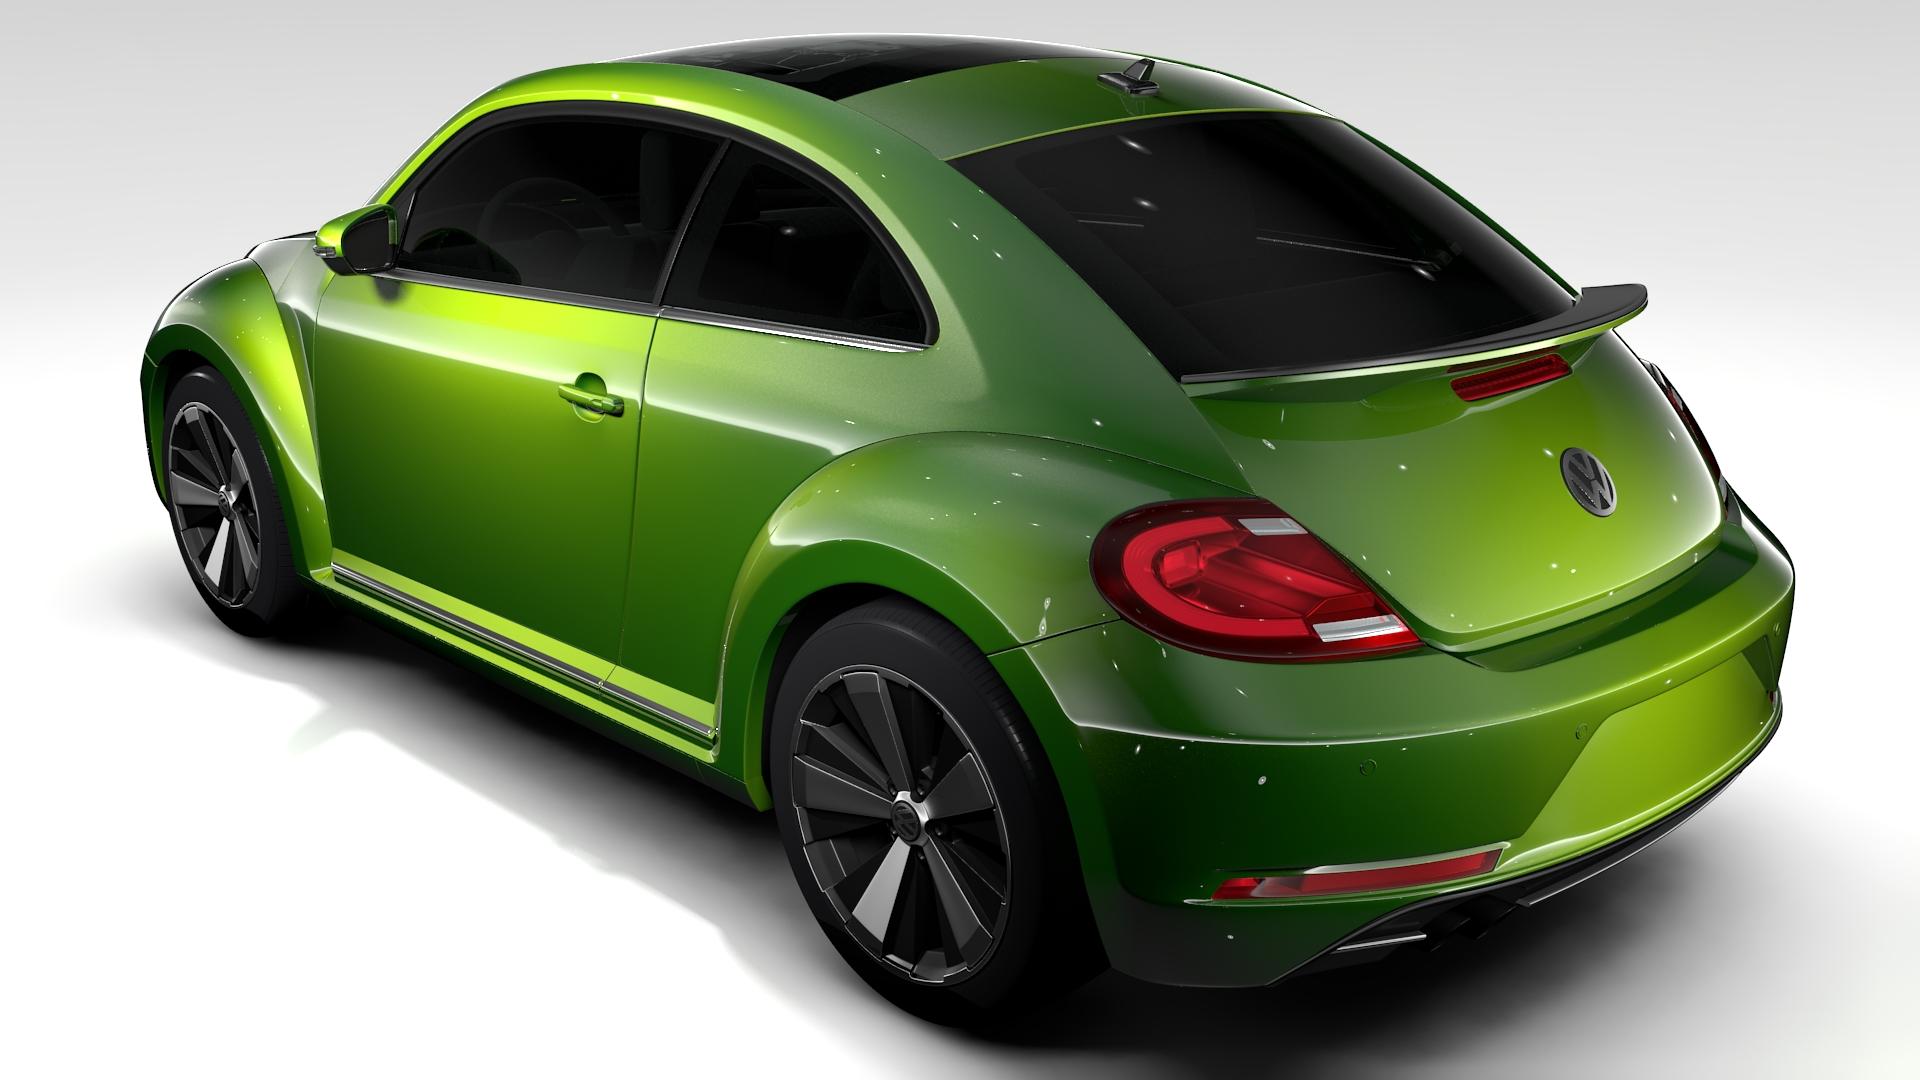 vw beetle 2017 3d model 3ds max fbx c4d lwo ma mb hrc xsi obj 221570